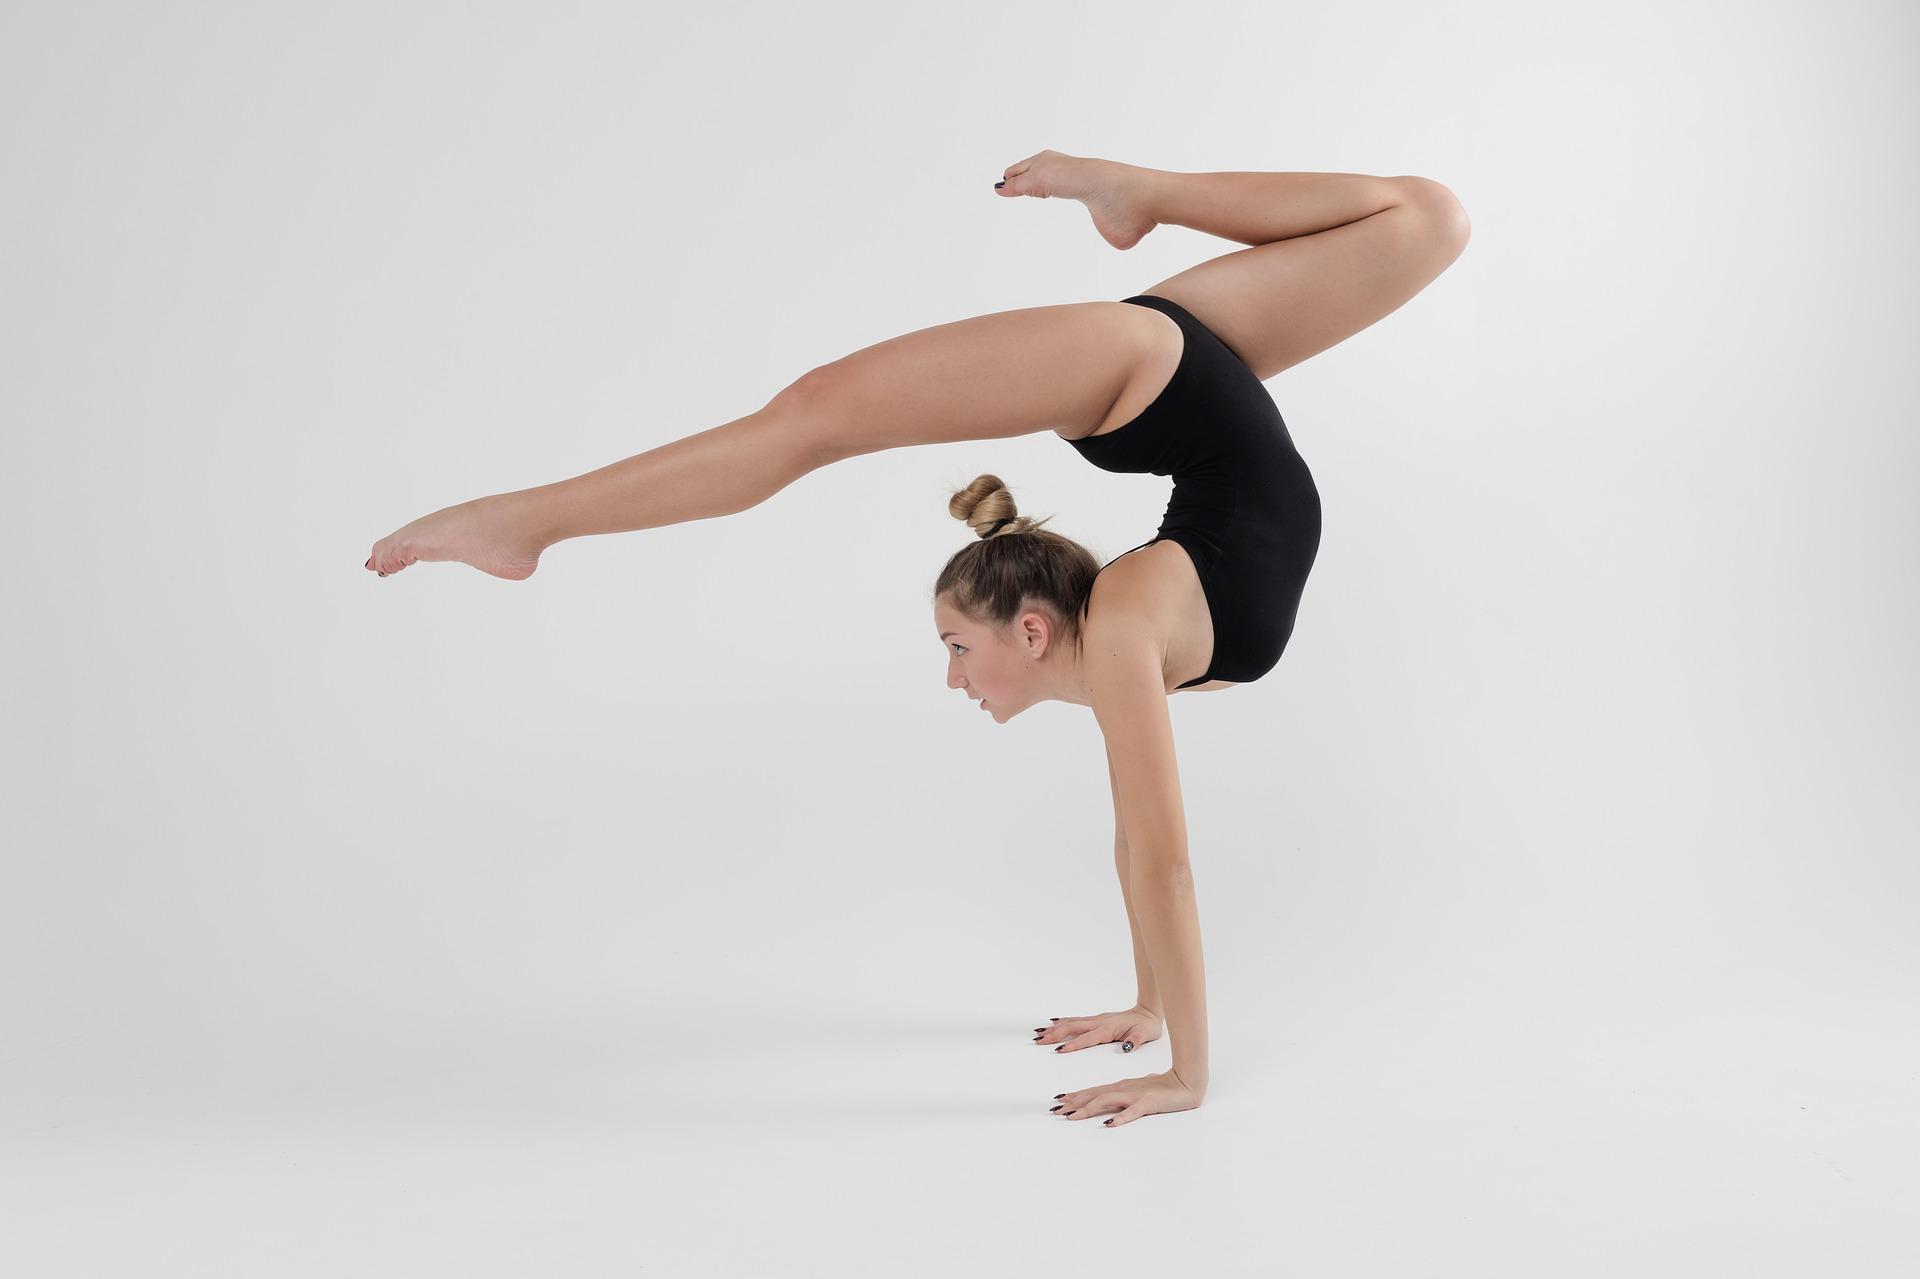 Quality Girls Gymnastics Wear